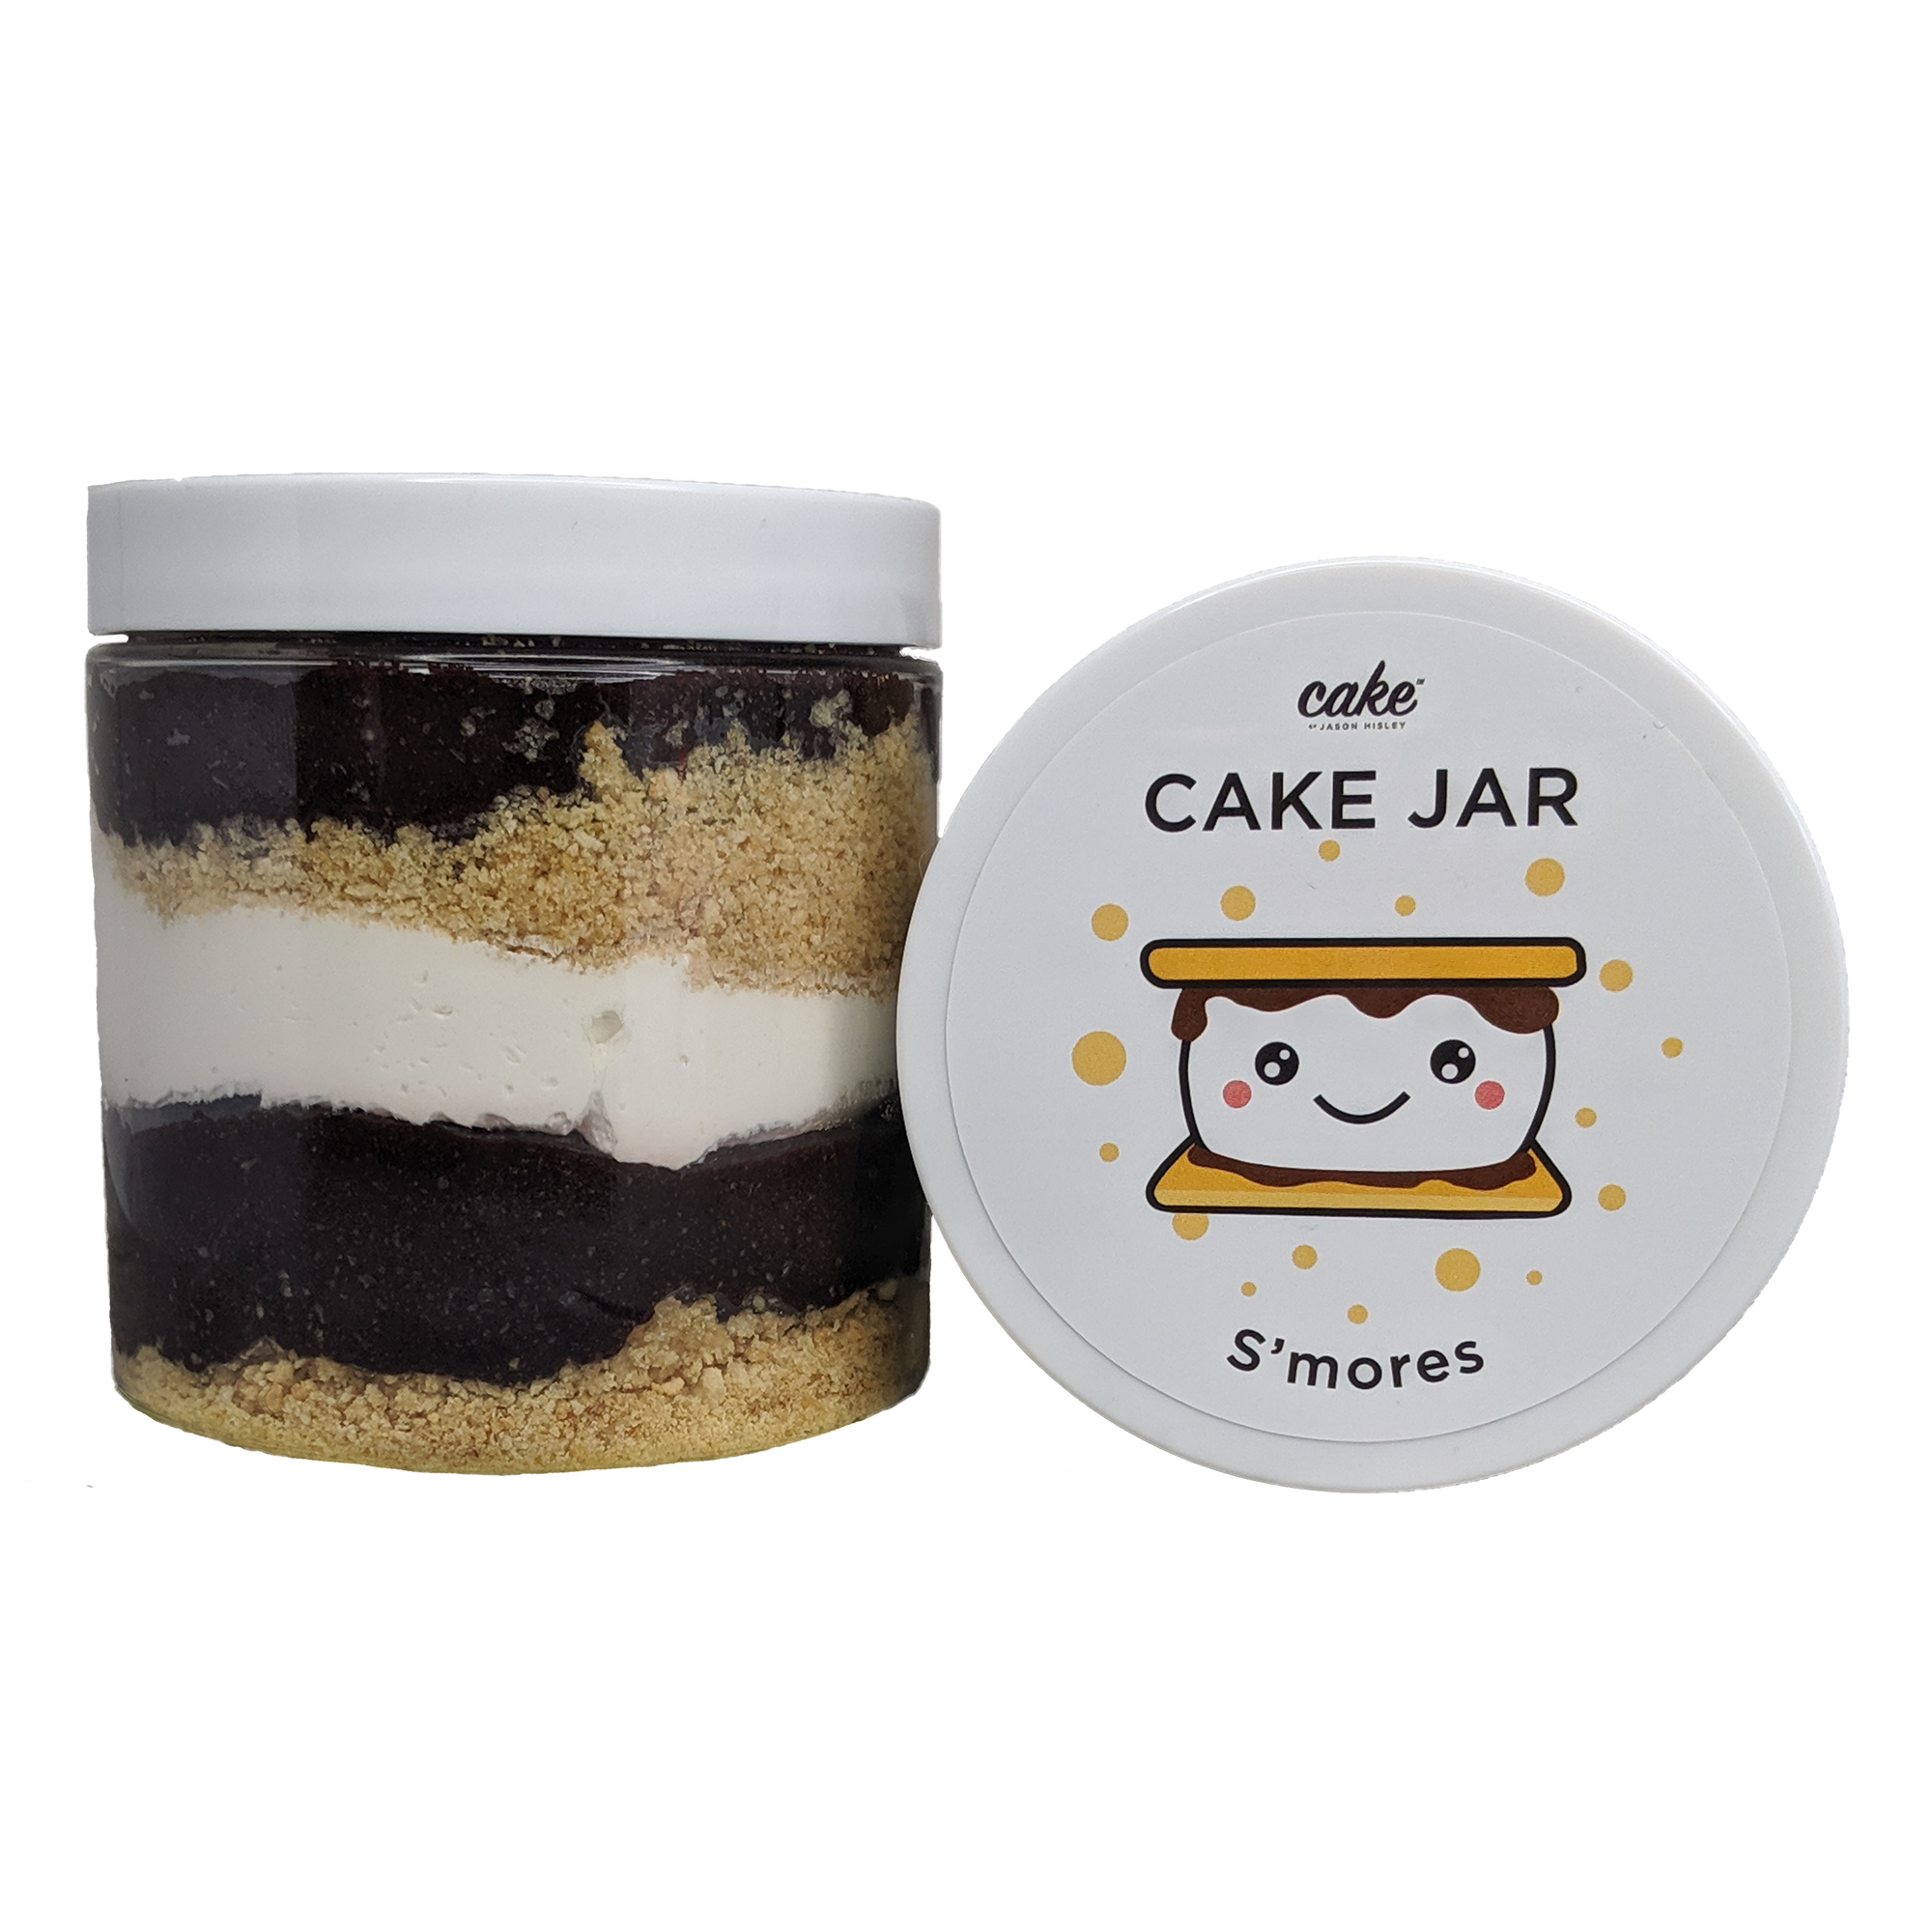 S'mores Cake Jar